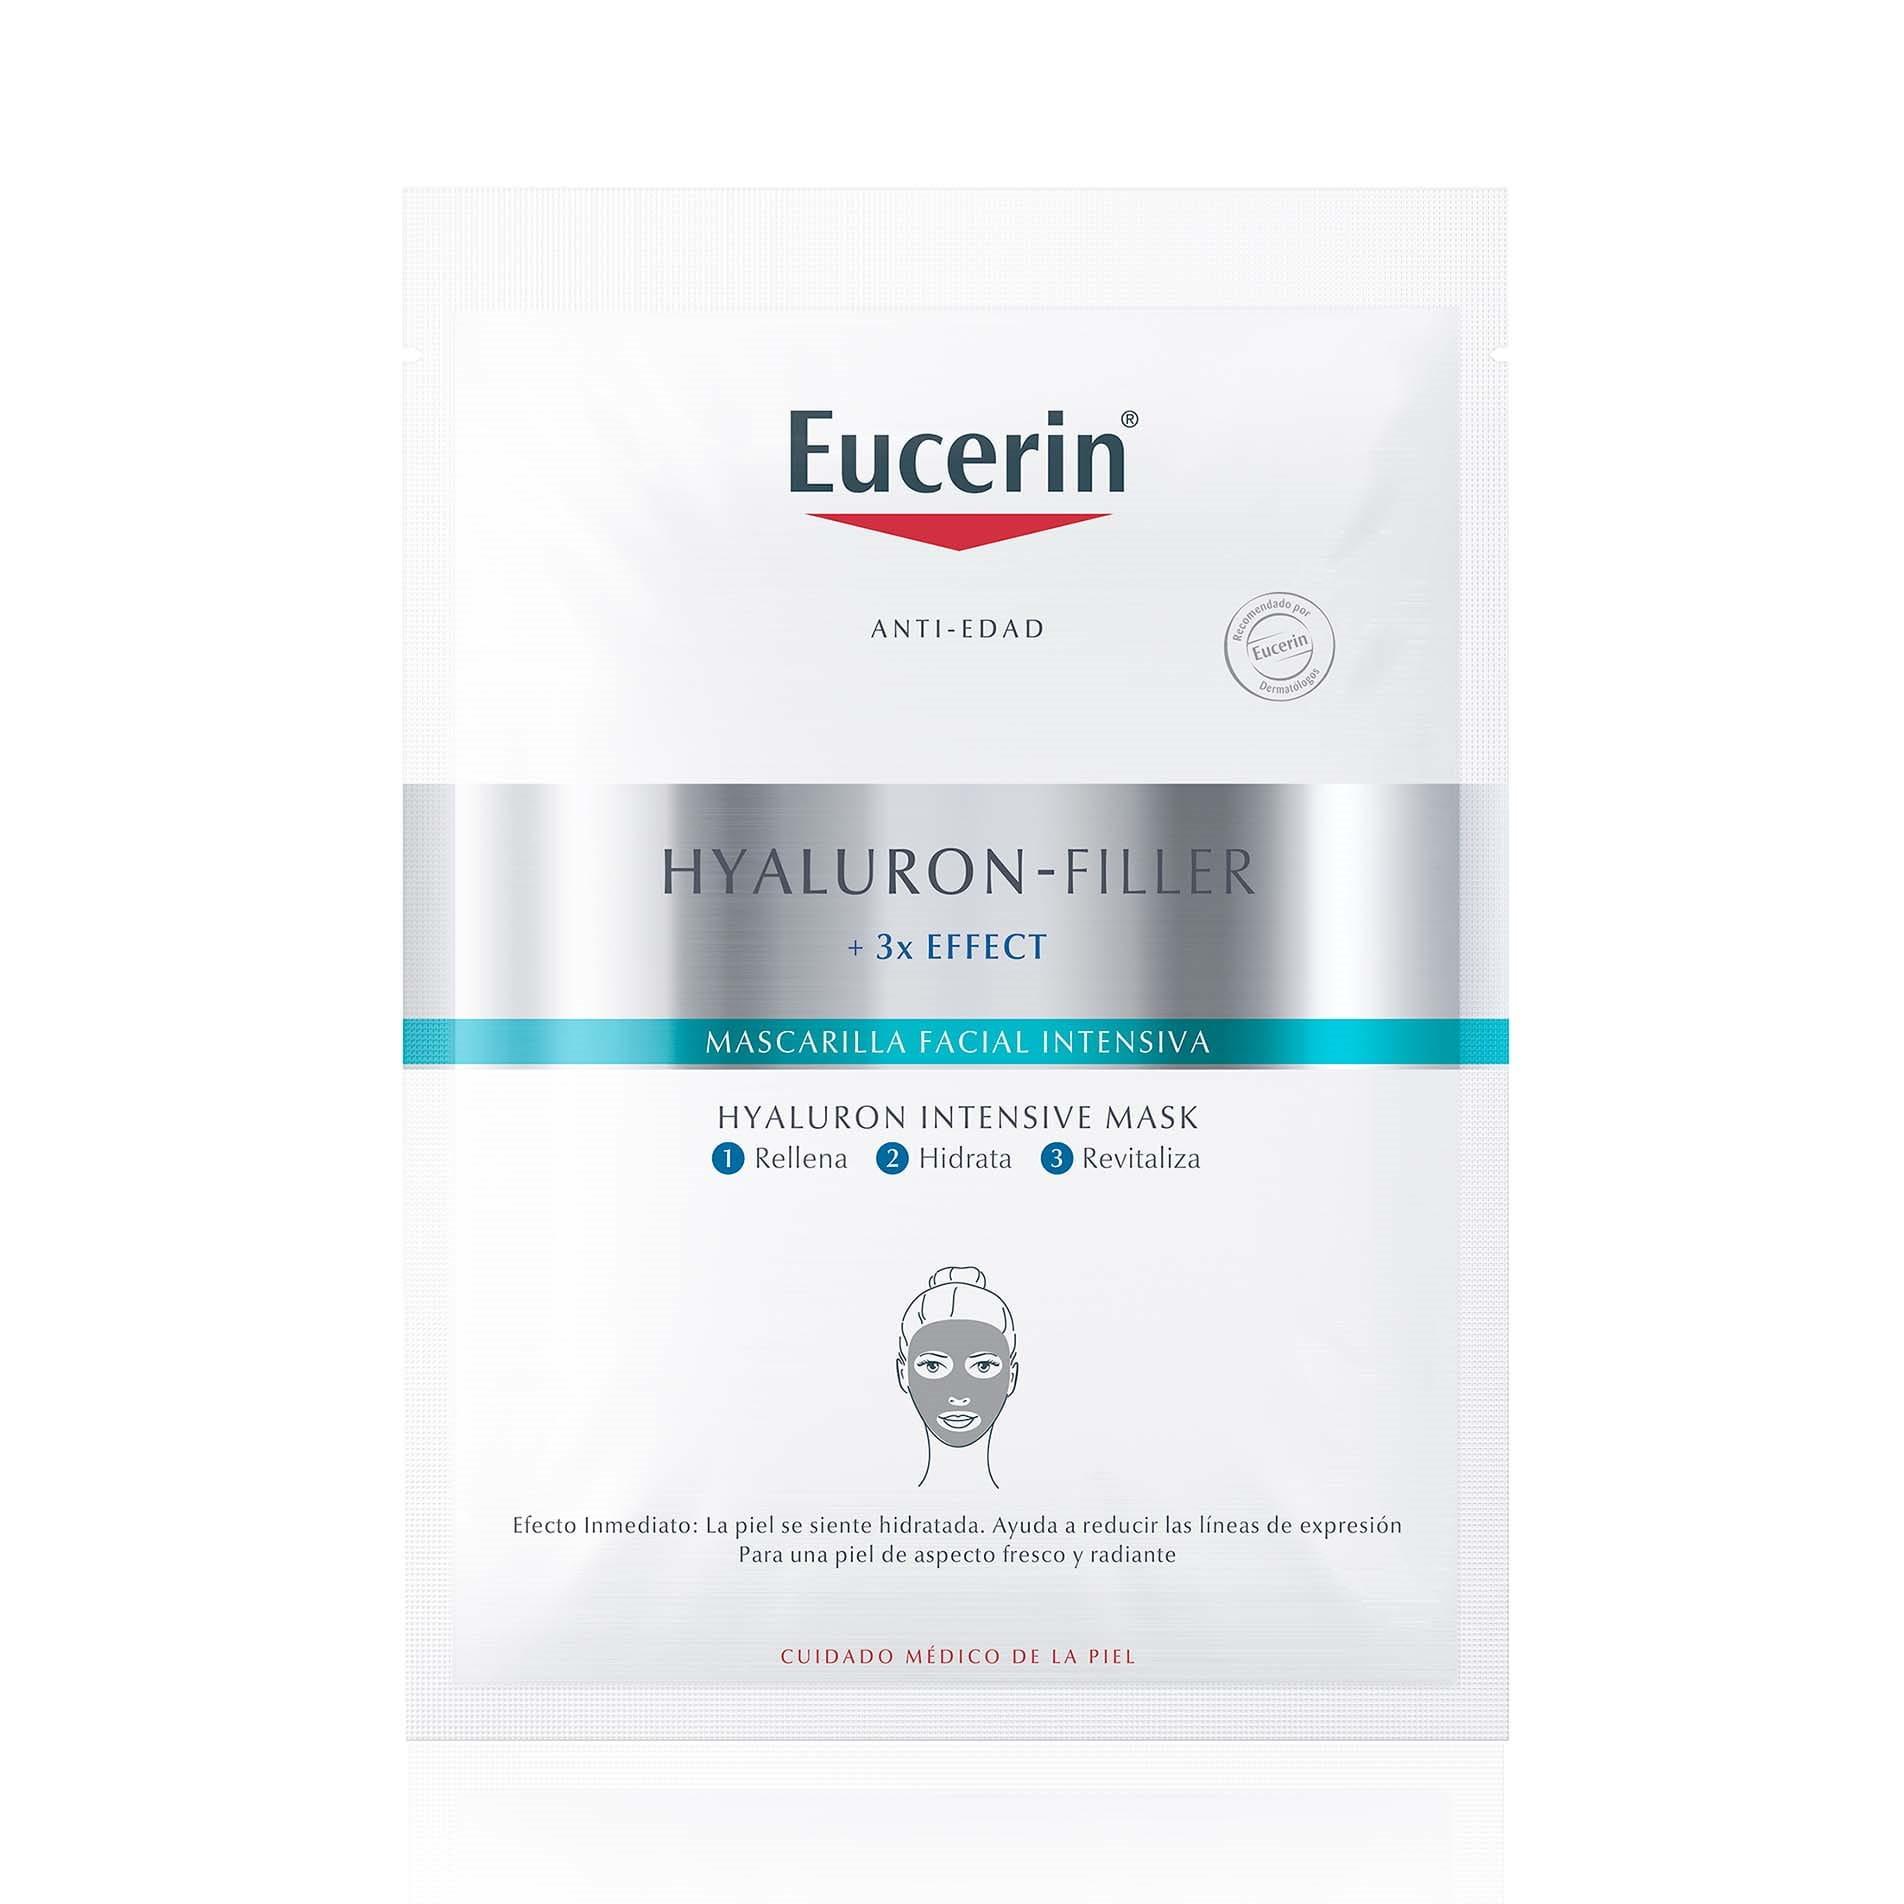 Eucerin Hyaluron-Filler Mascarilla Facial Intensiva